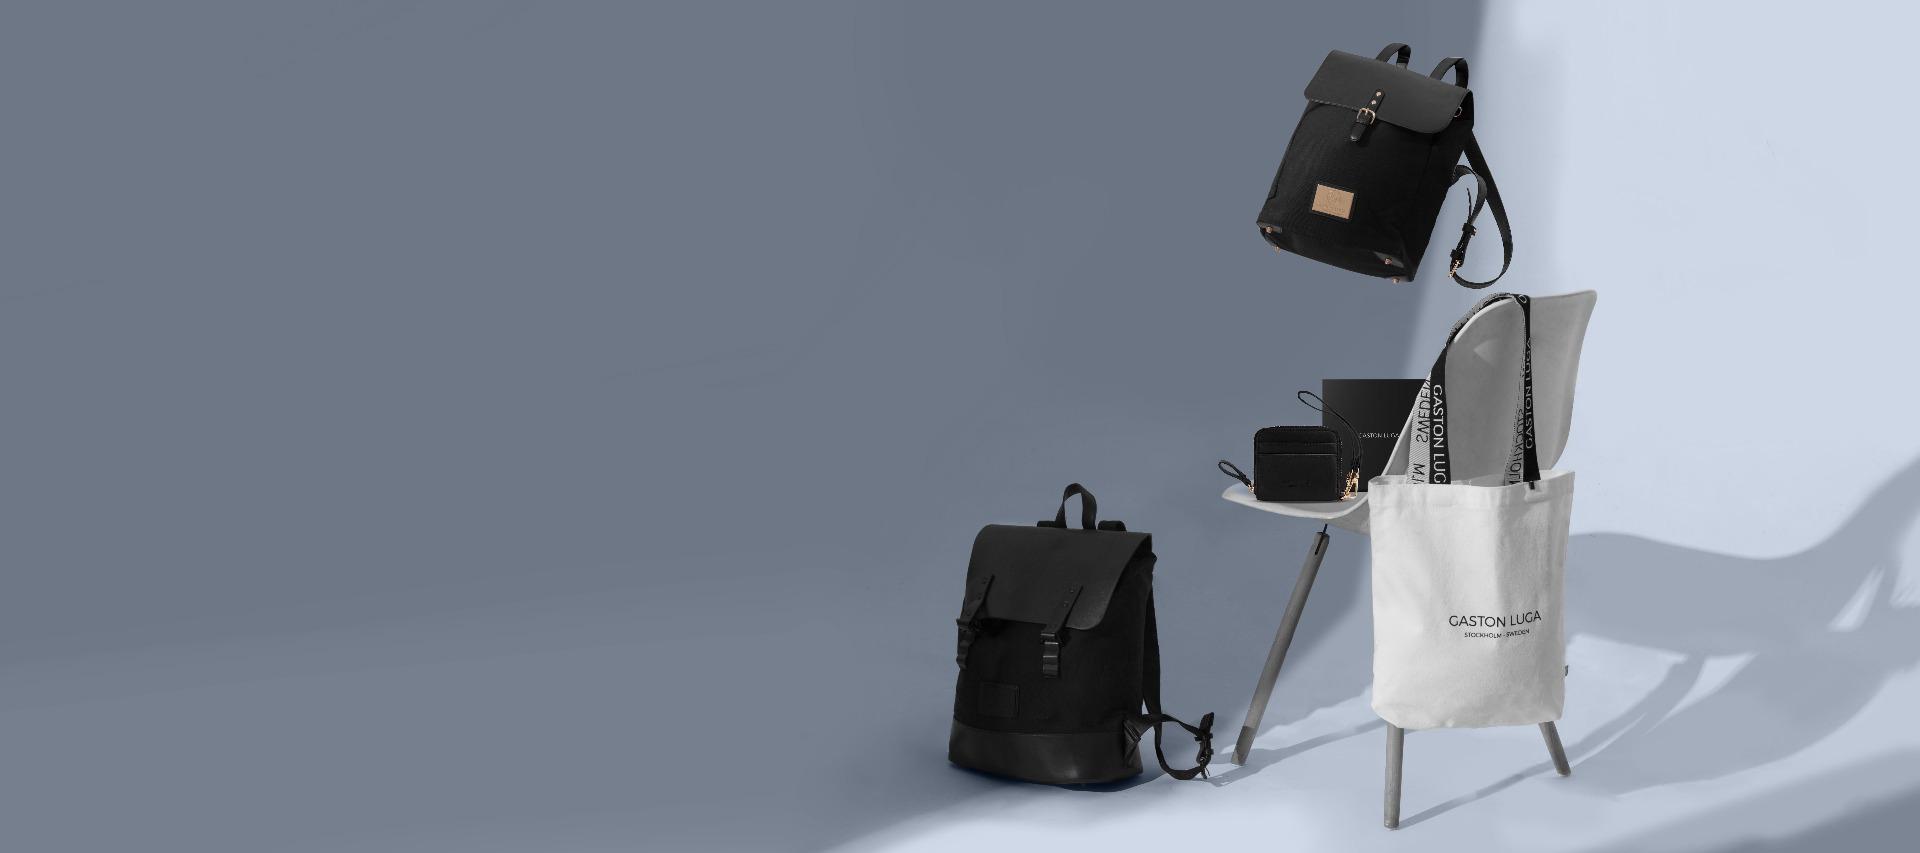 Gaston Luga - 北歐設計雙肩包官方網站